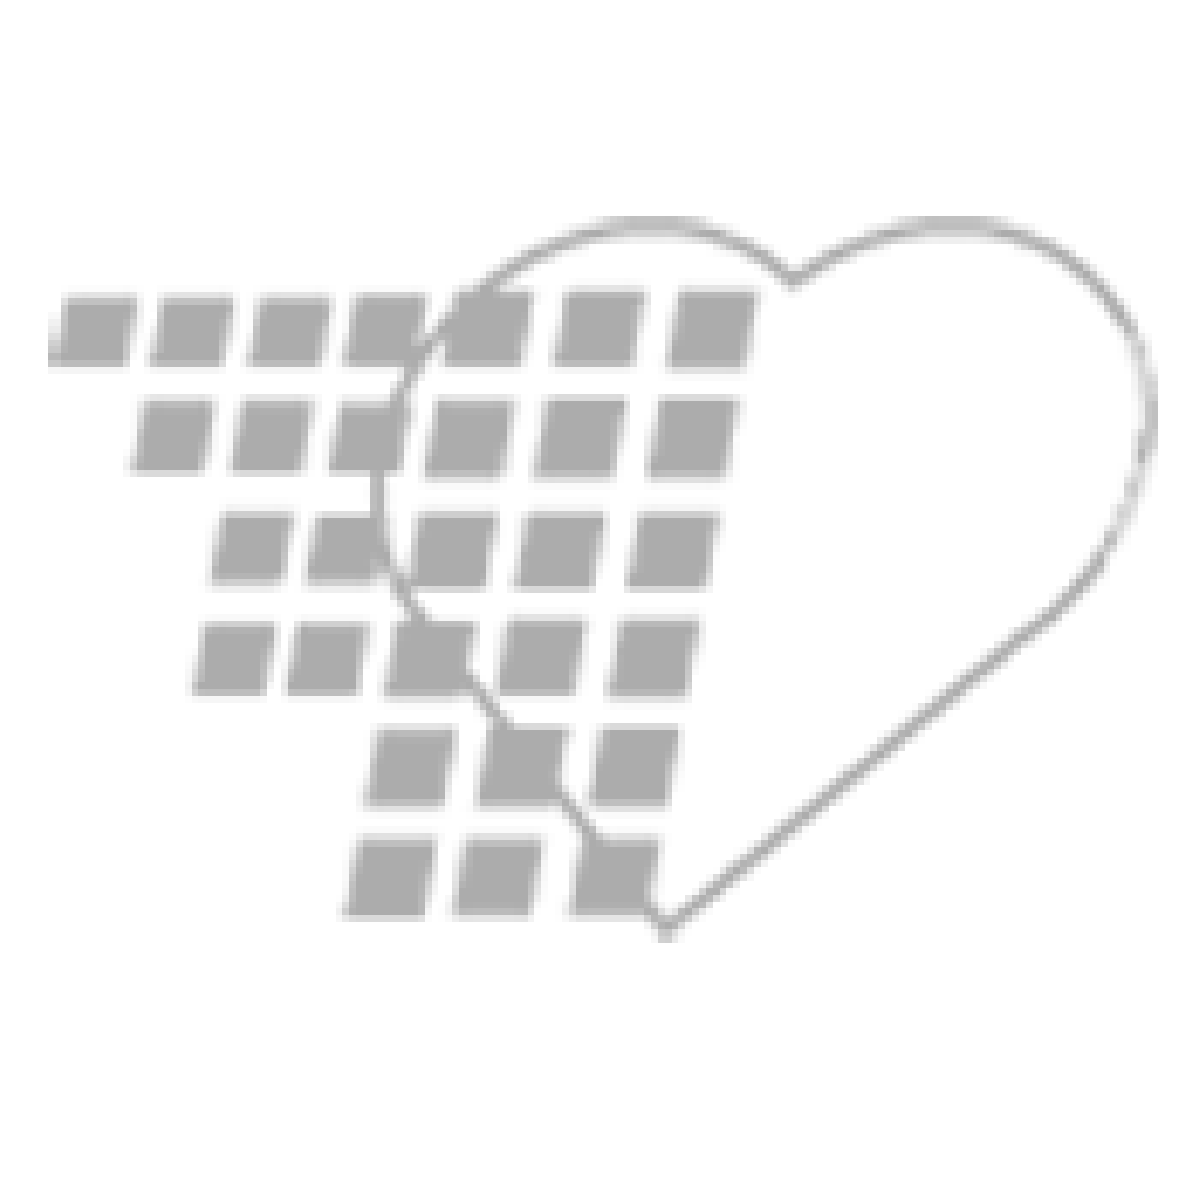 12-81-2556 Laerdal Infant Airway Management  Trainer